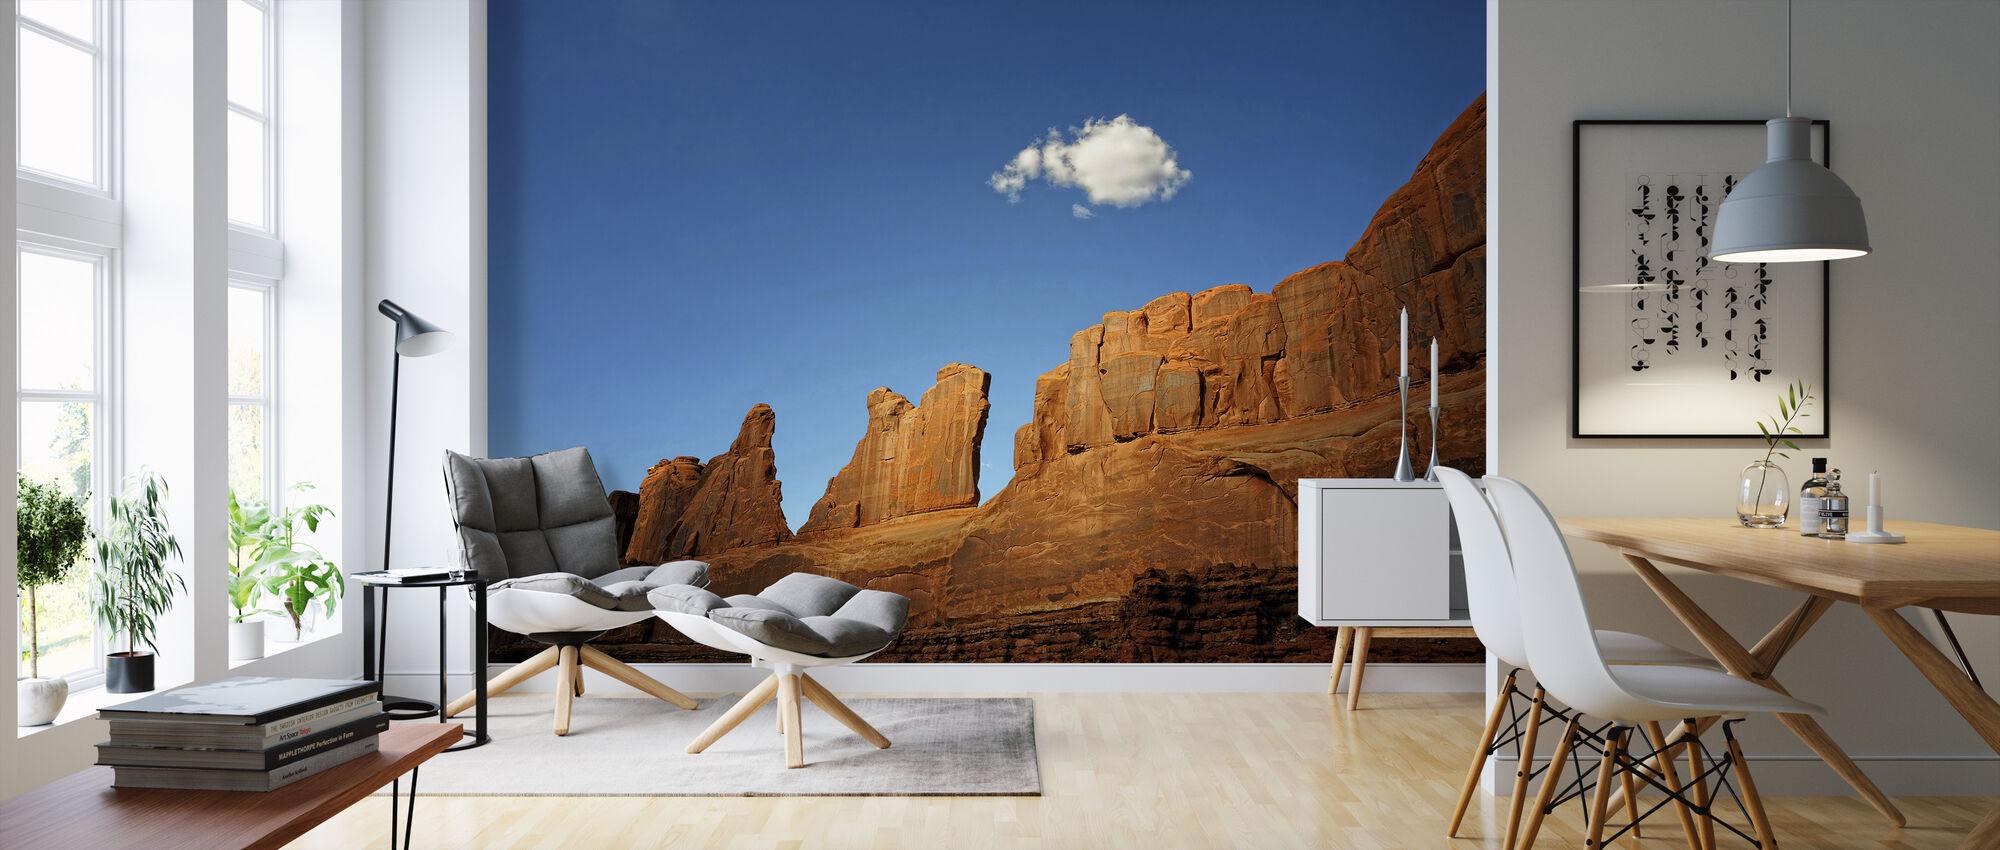 arches national park fototapete nach ma photowall. Black Bedroom Furniture Sets. Home Design Ideas